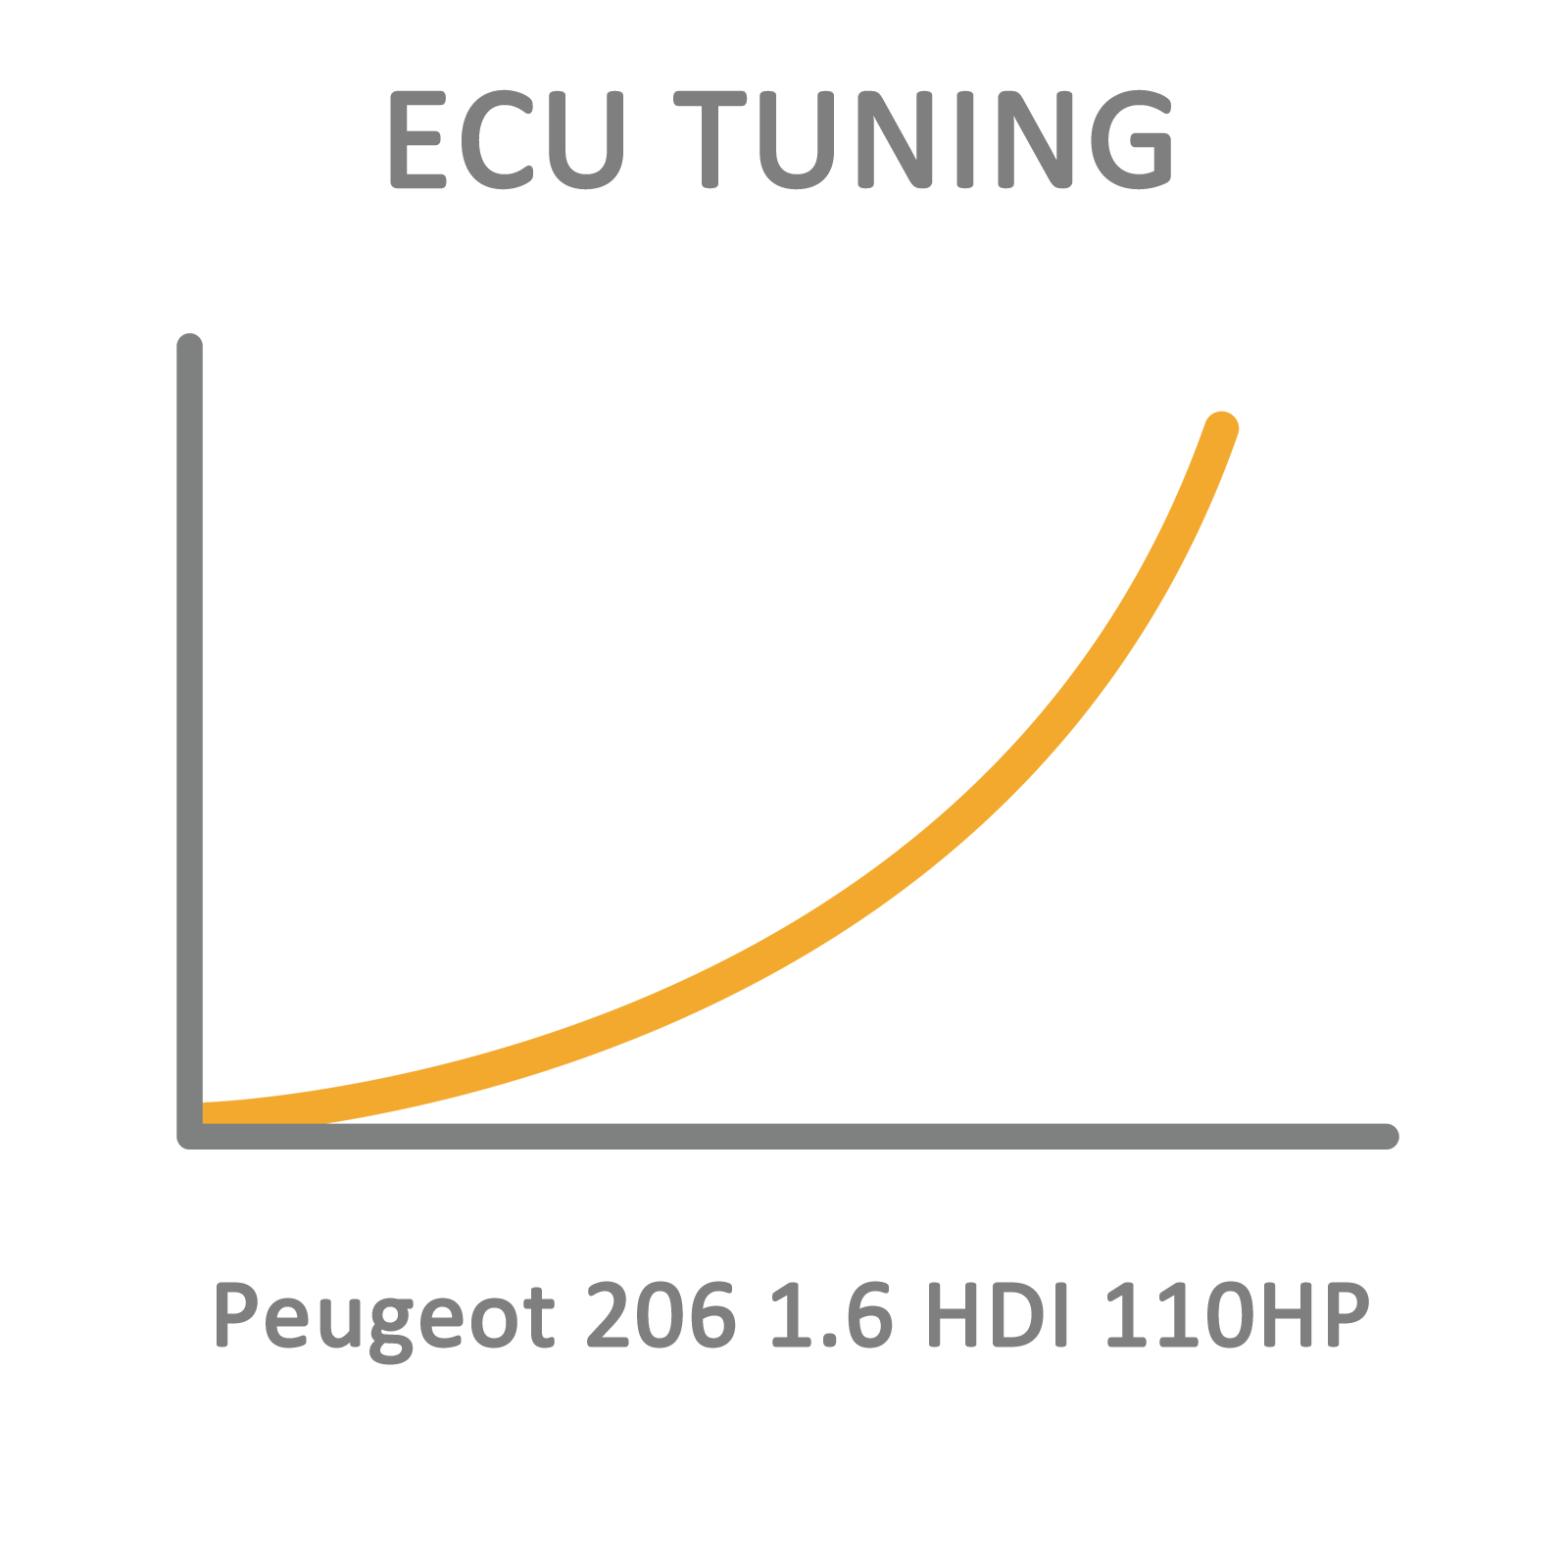 Peugeot 206 1.6 HDI 110HP ECU Tuning Remapping Programming